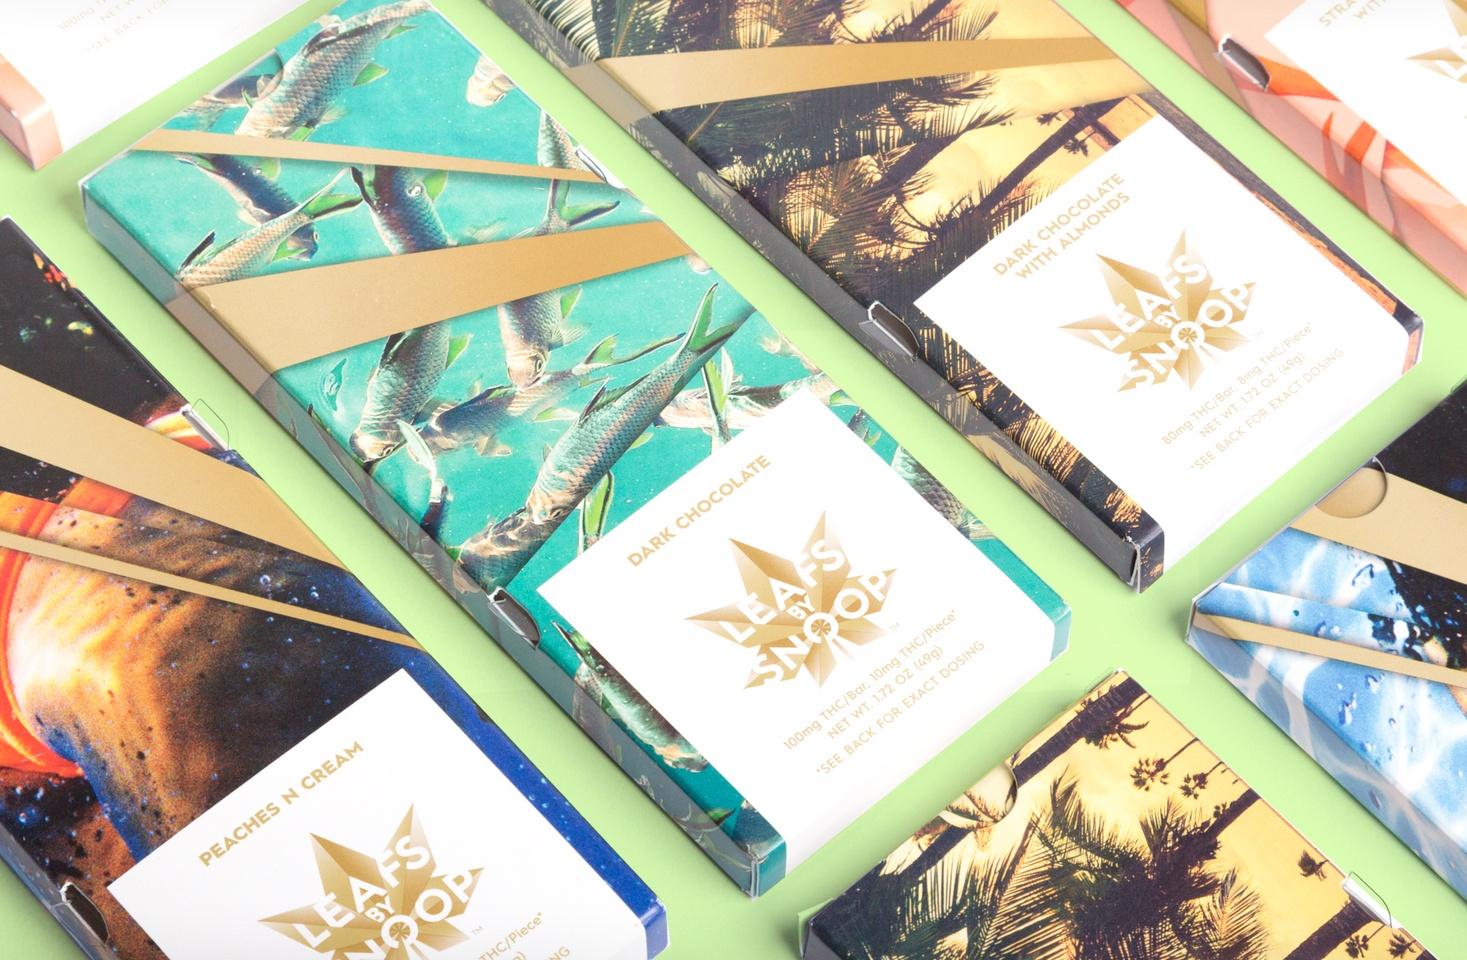 Leafs-Packaging-Design-2